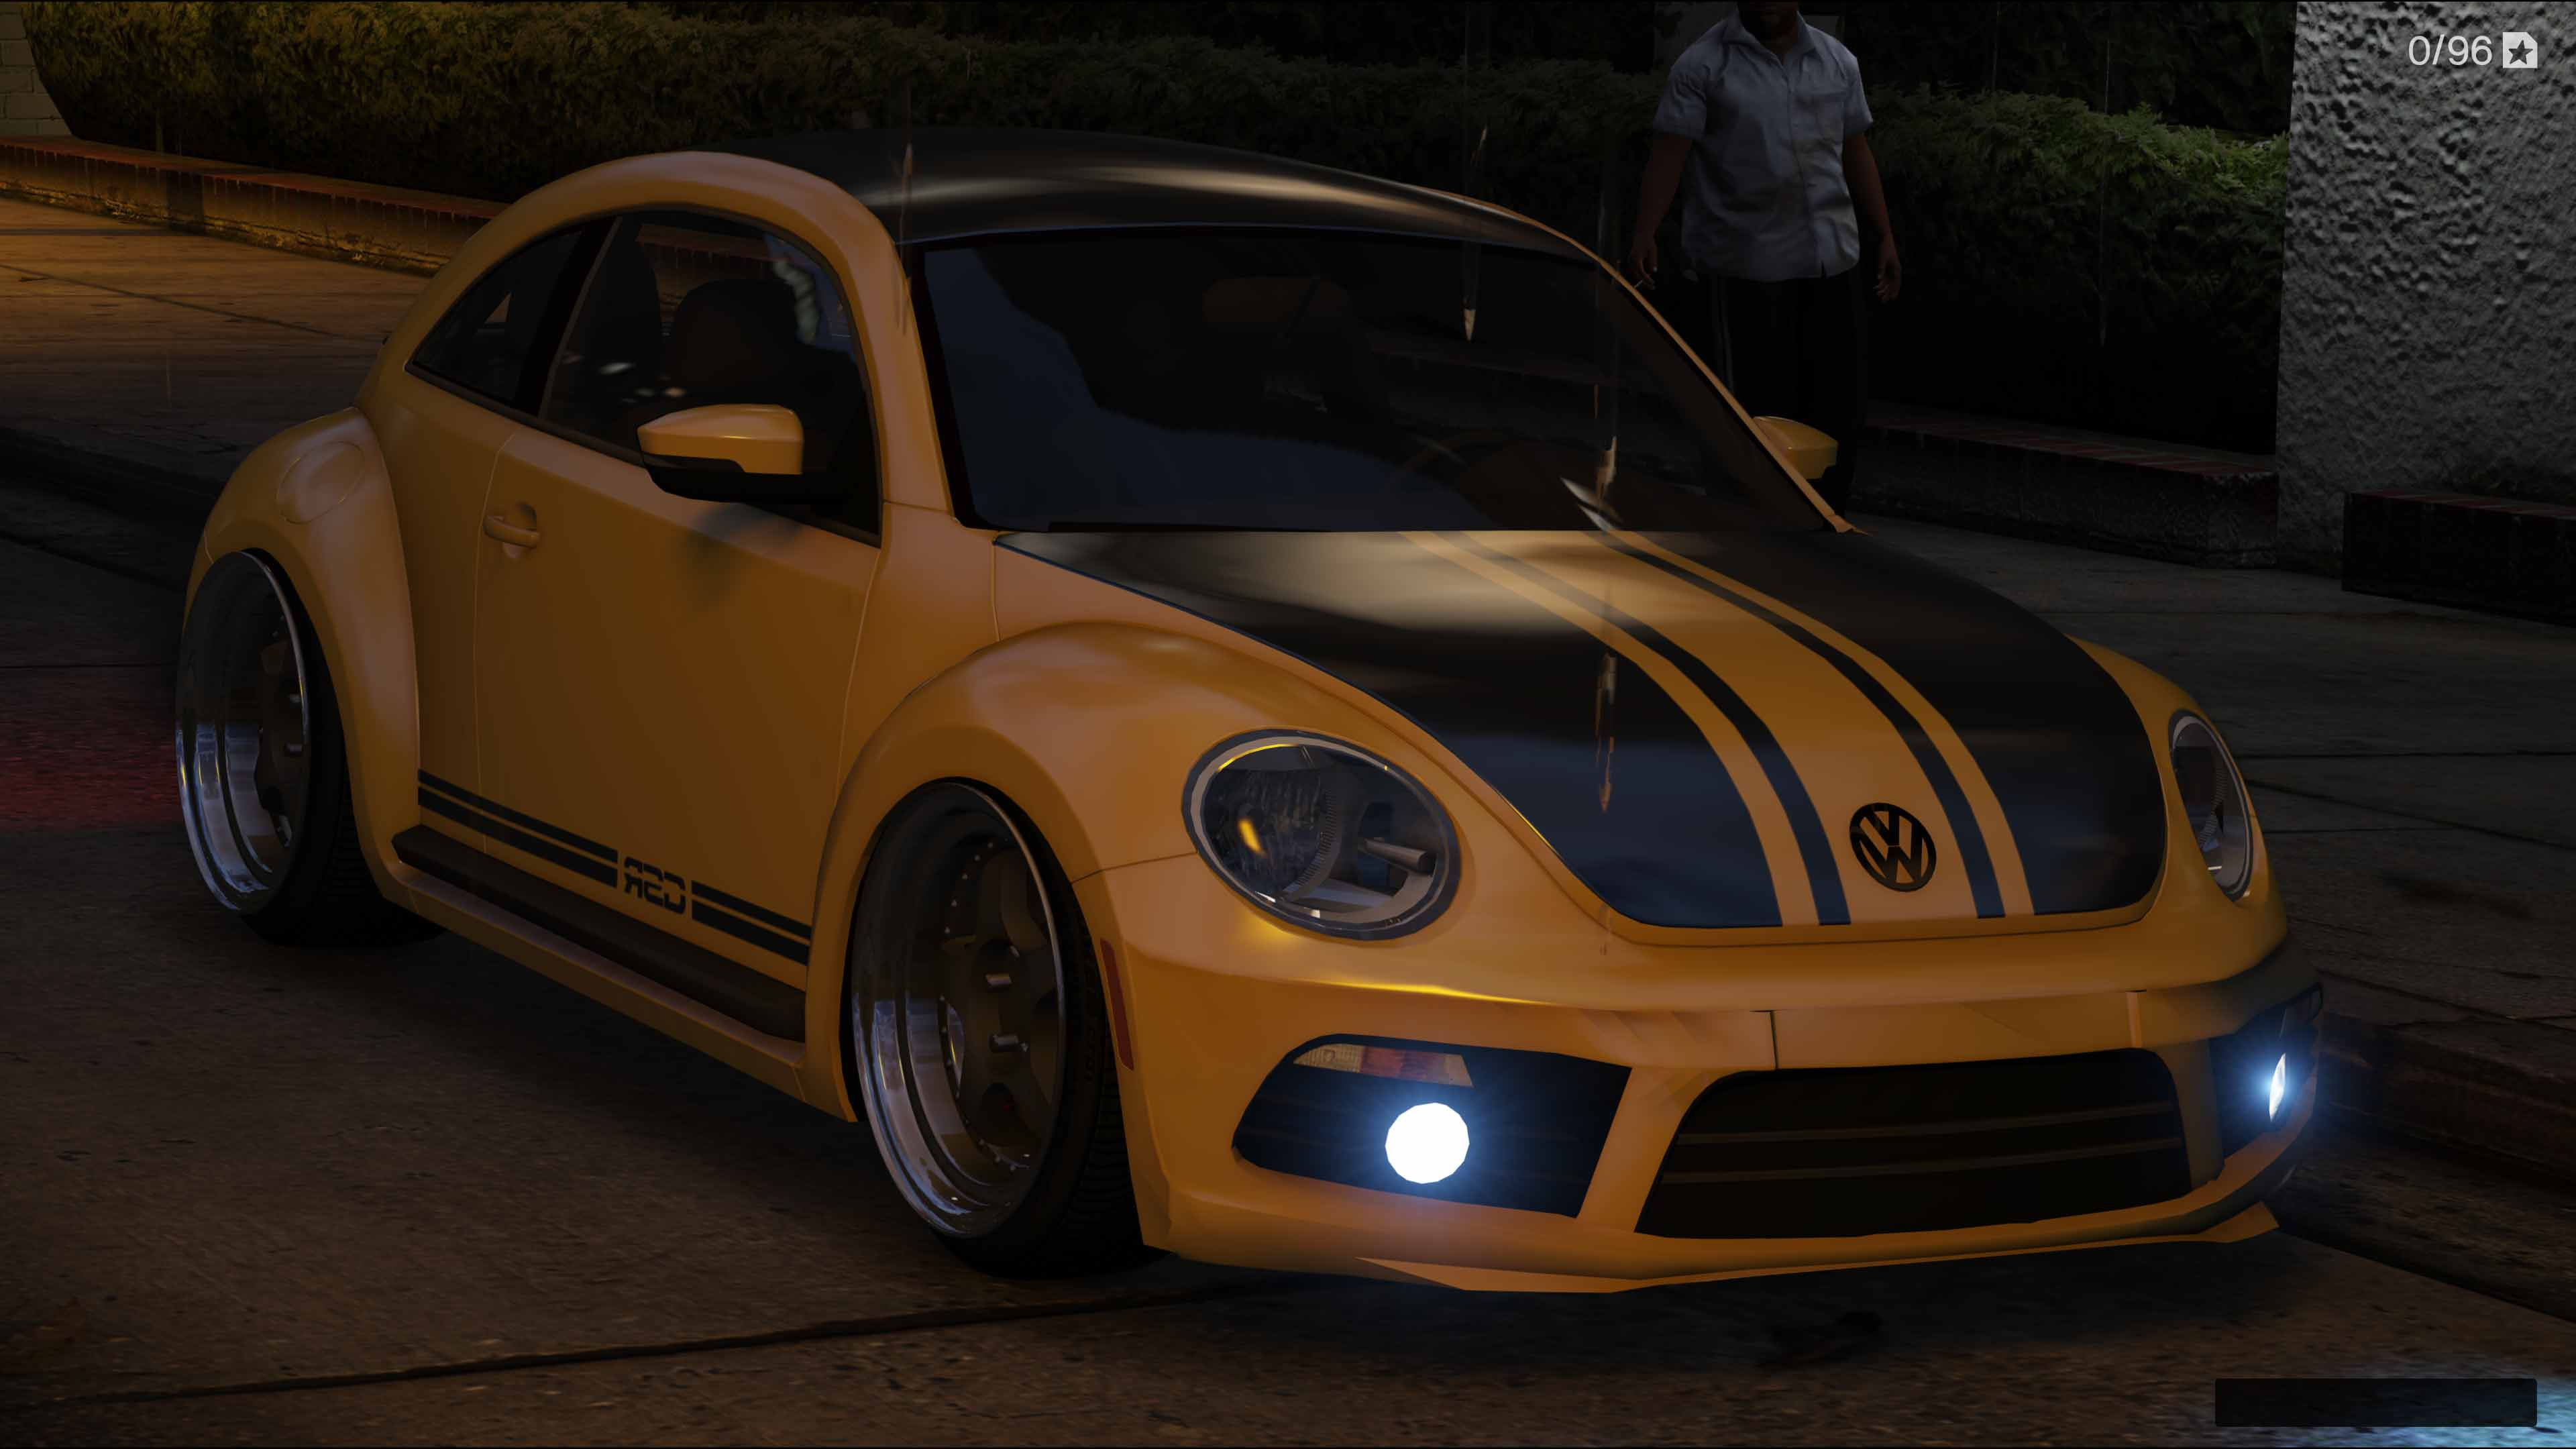 2012 Limited Edition Vw Beetle Gsr Gta5 Mods Com